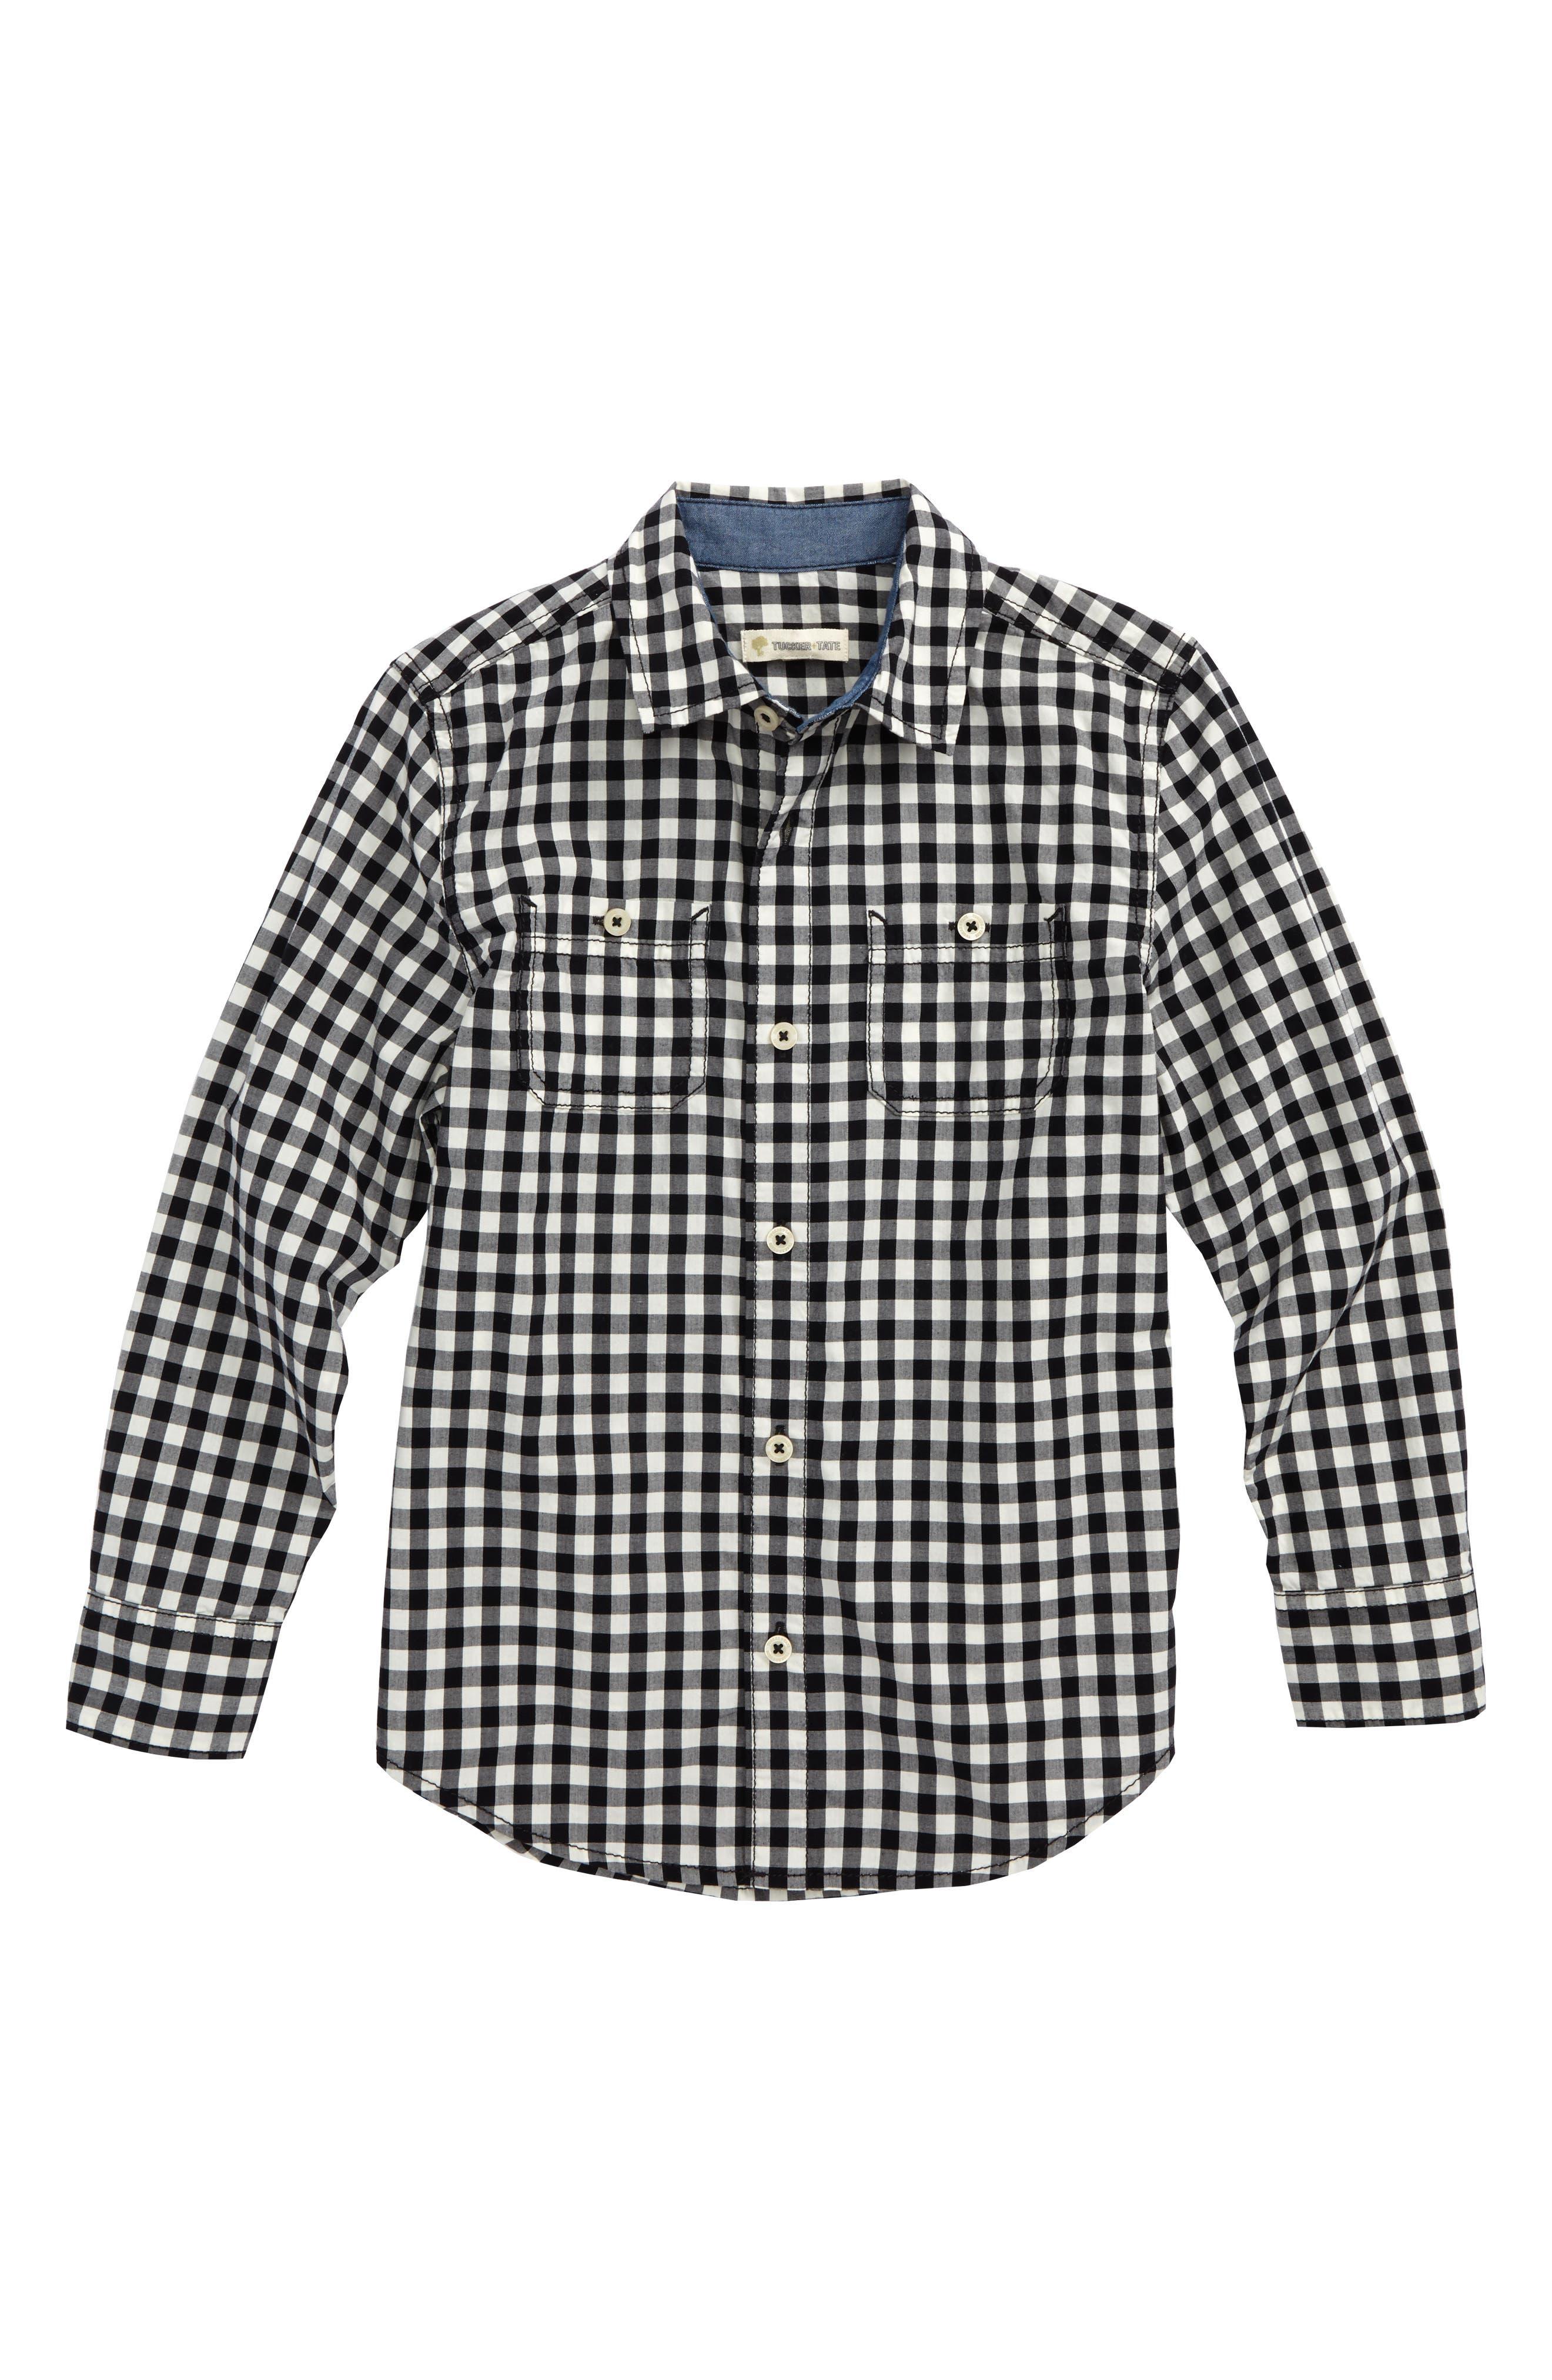 'Photo' Buffalo Plaid Woven Shirt,                             Main thumbnail 1, color,                             BLACK- IVORY GINGHAM